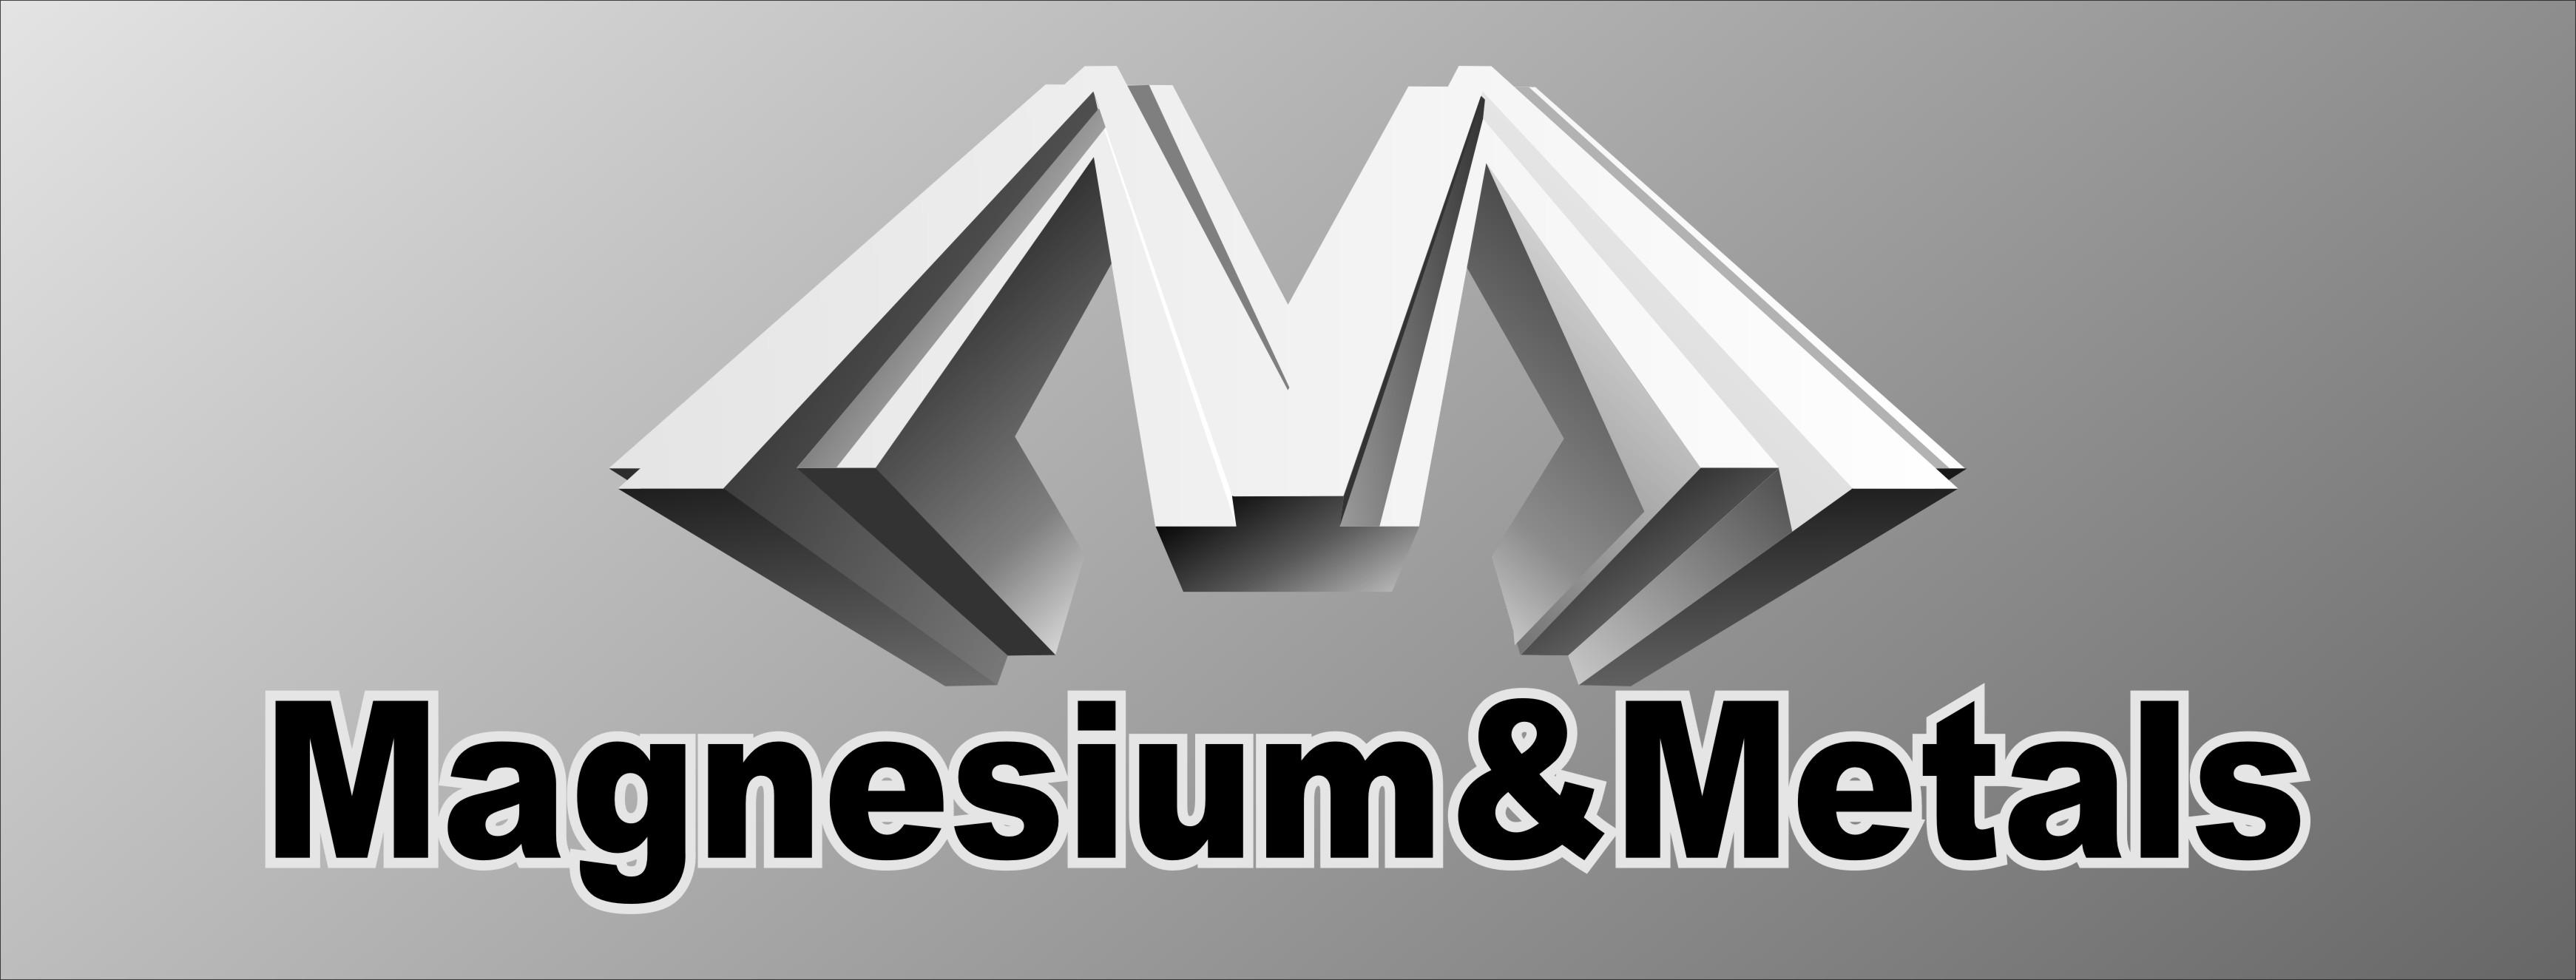 Логотип для проекта Magnesium&Metals фото f_4e7c0d8cd4f3e.jpg